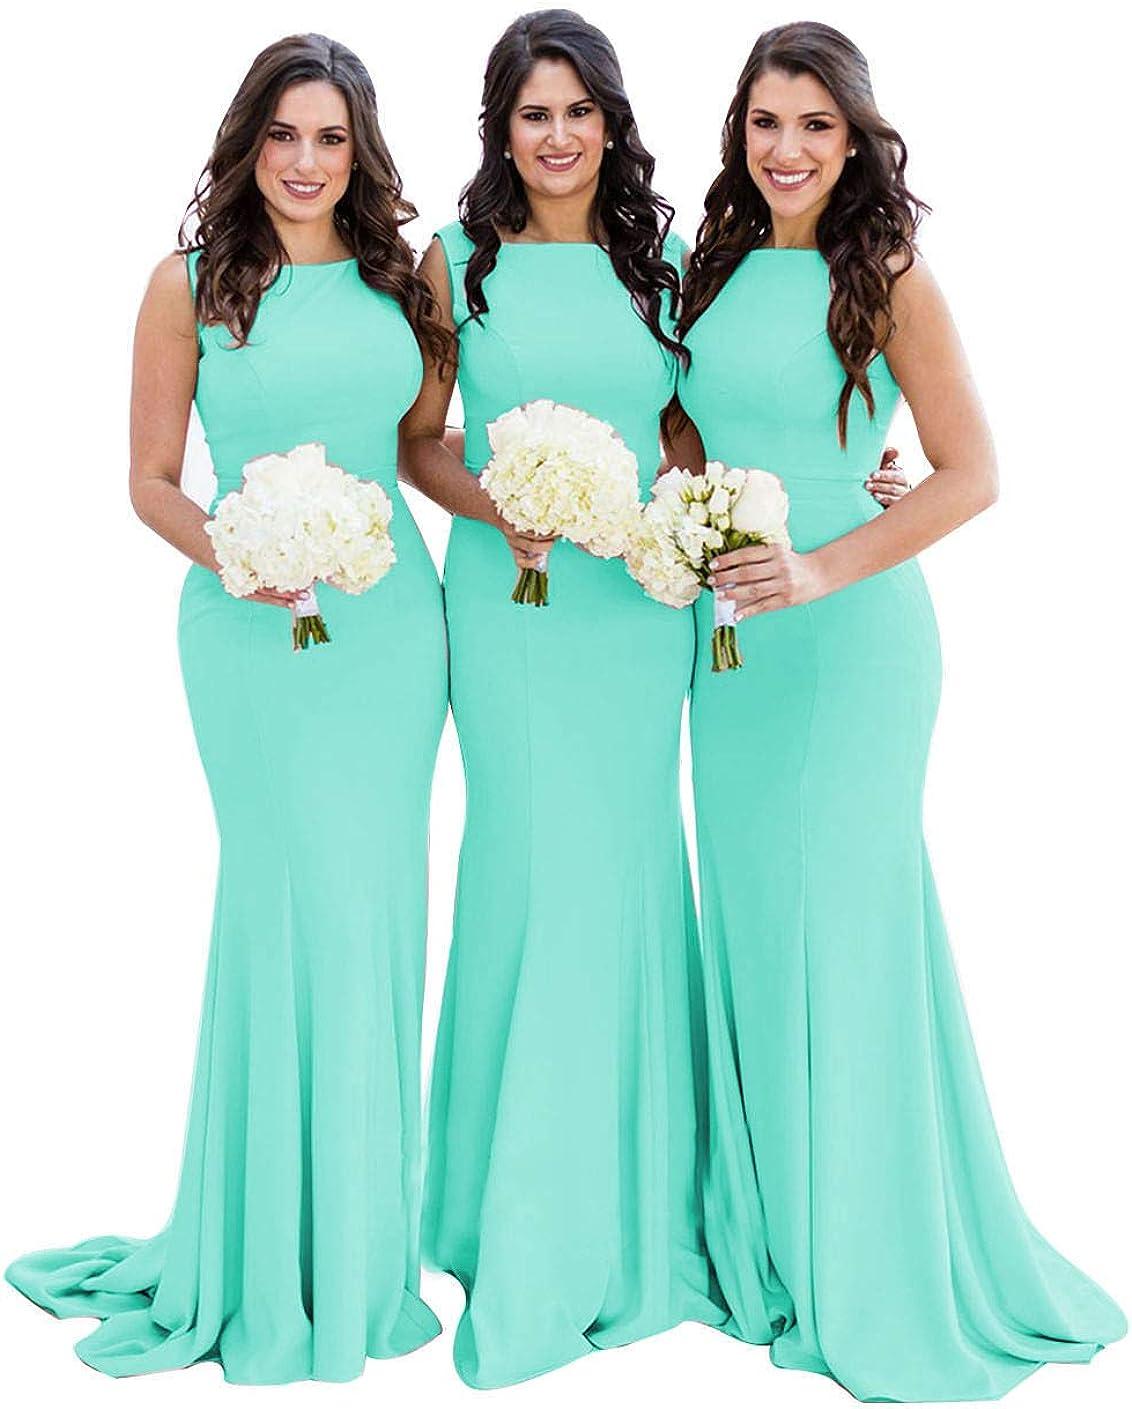 Mermaid Bridesmaid Dresses 優先配送 メイルオーダー Long Formal Pa Wedding Backless Gowns